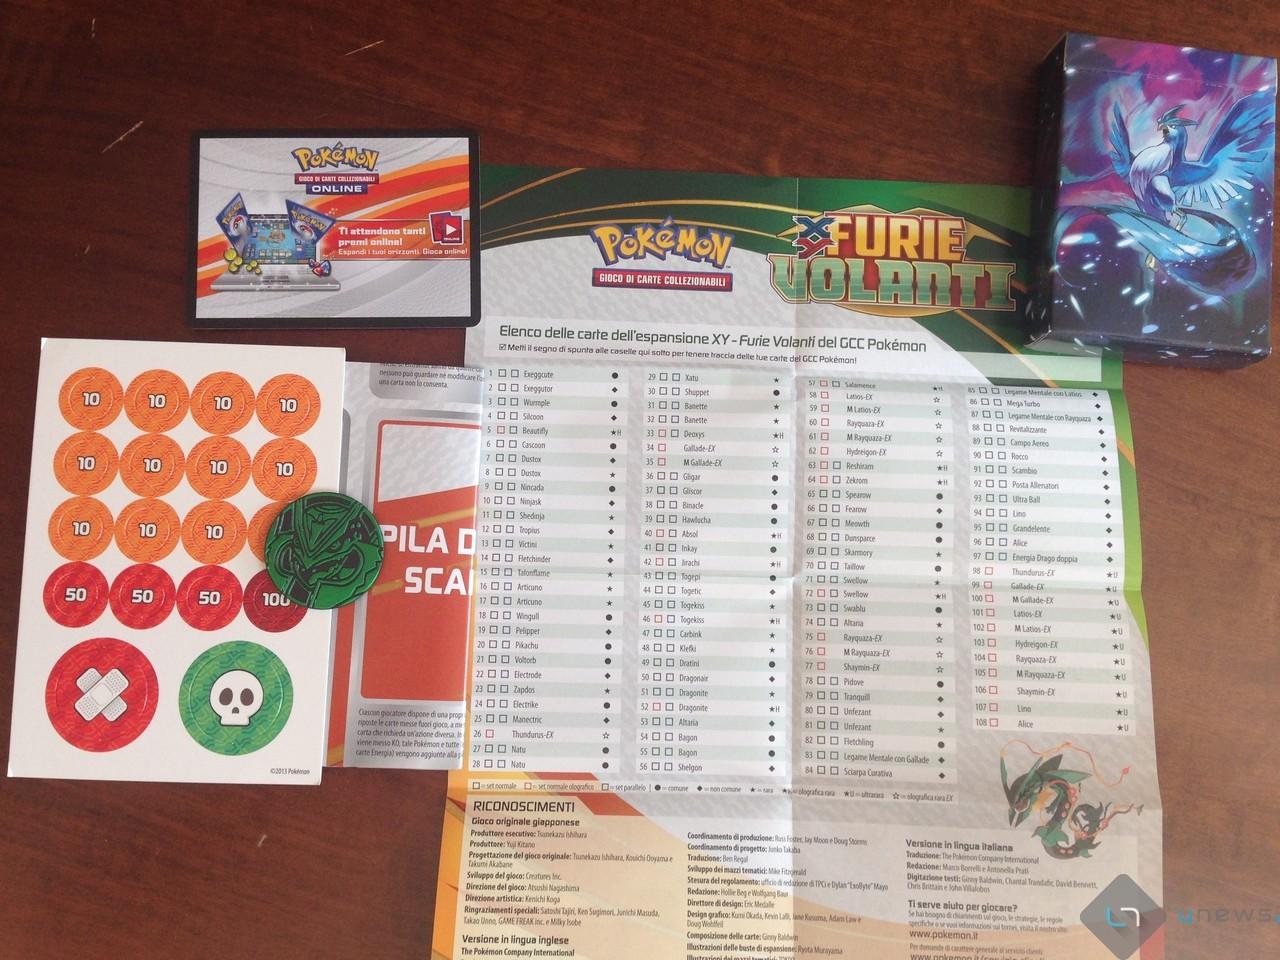 PokemonTGC RoaringSkies02